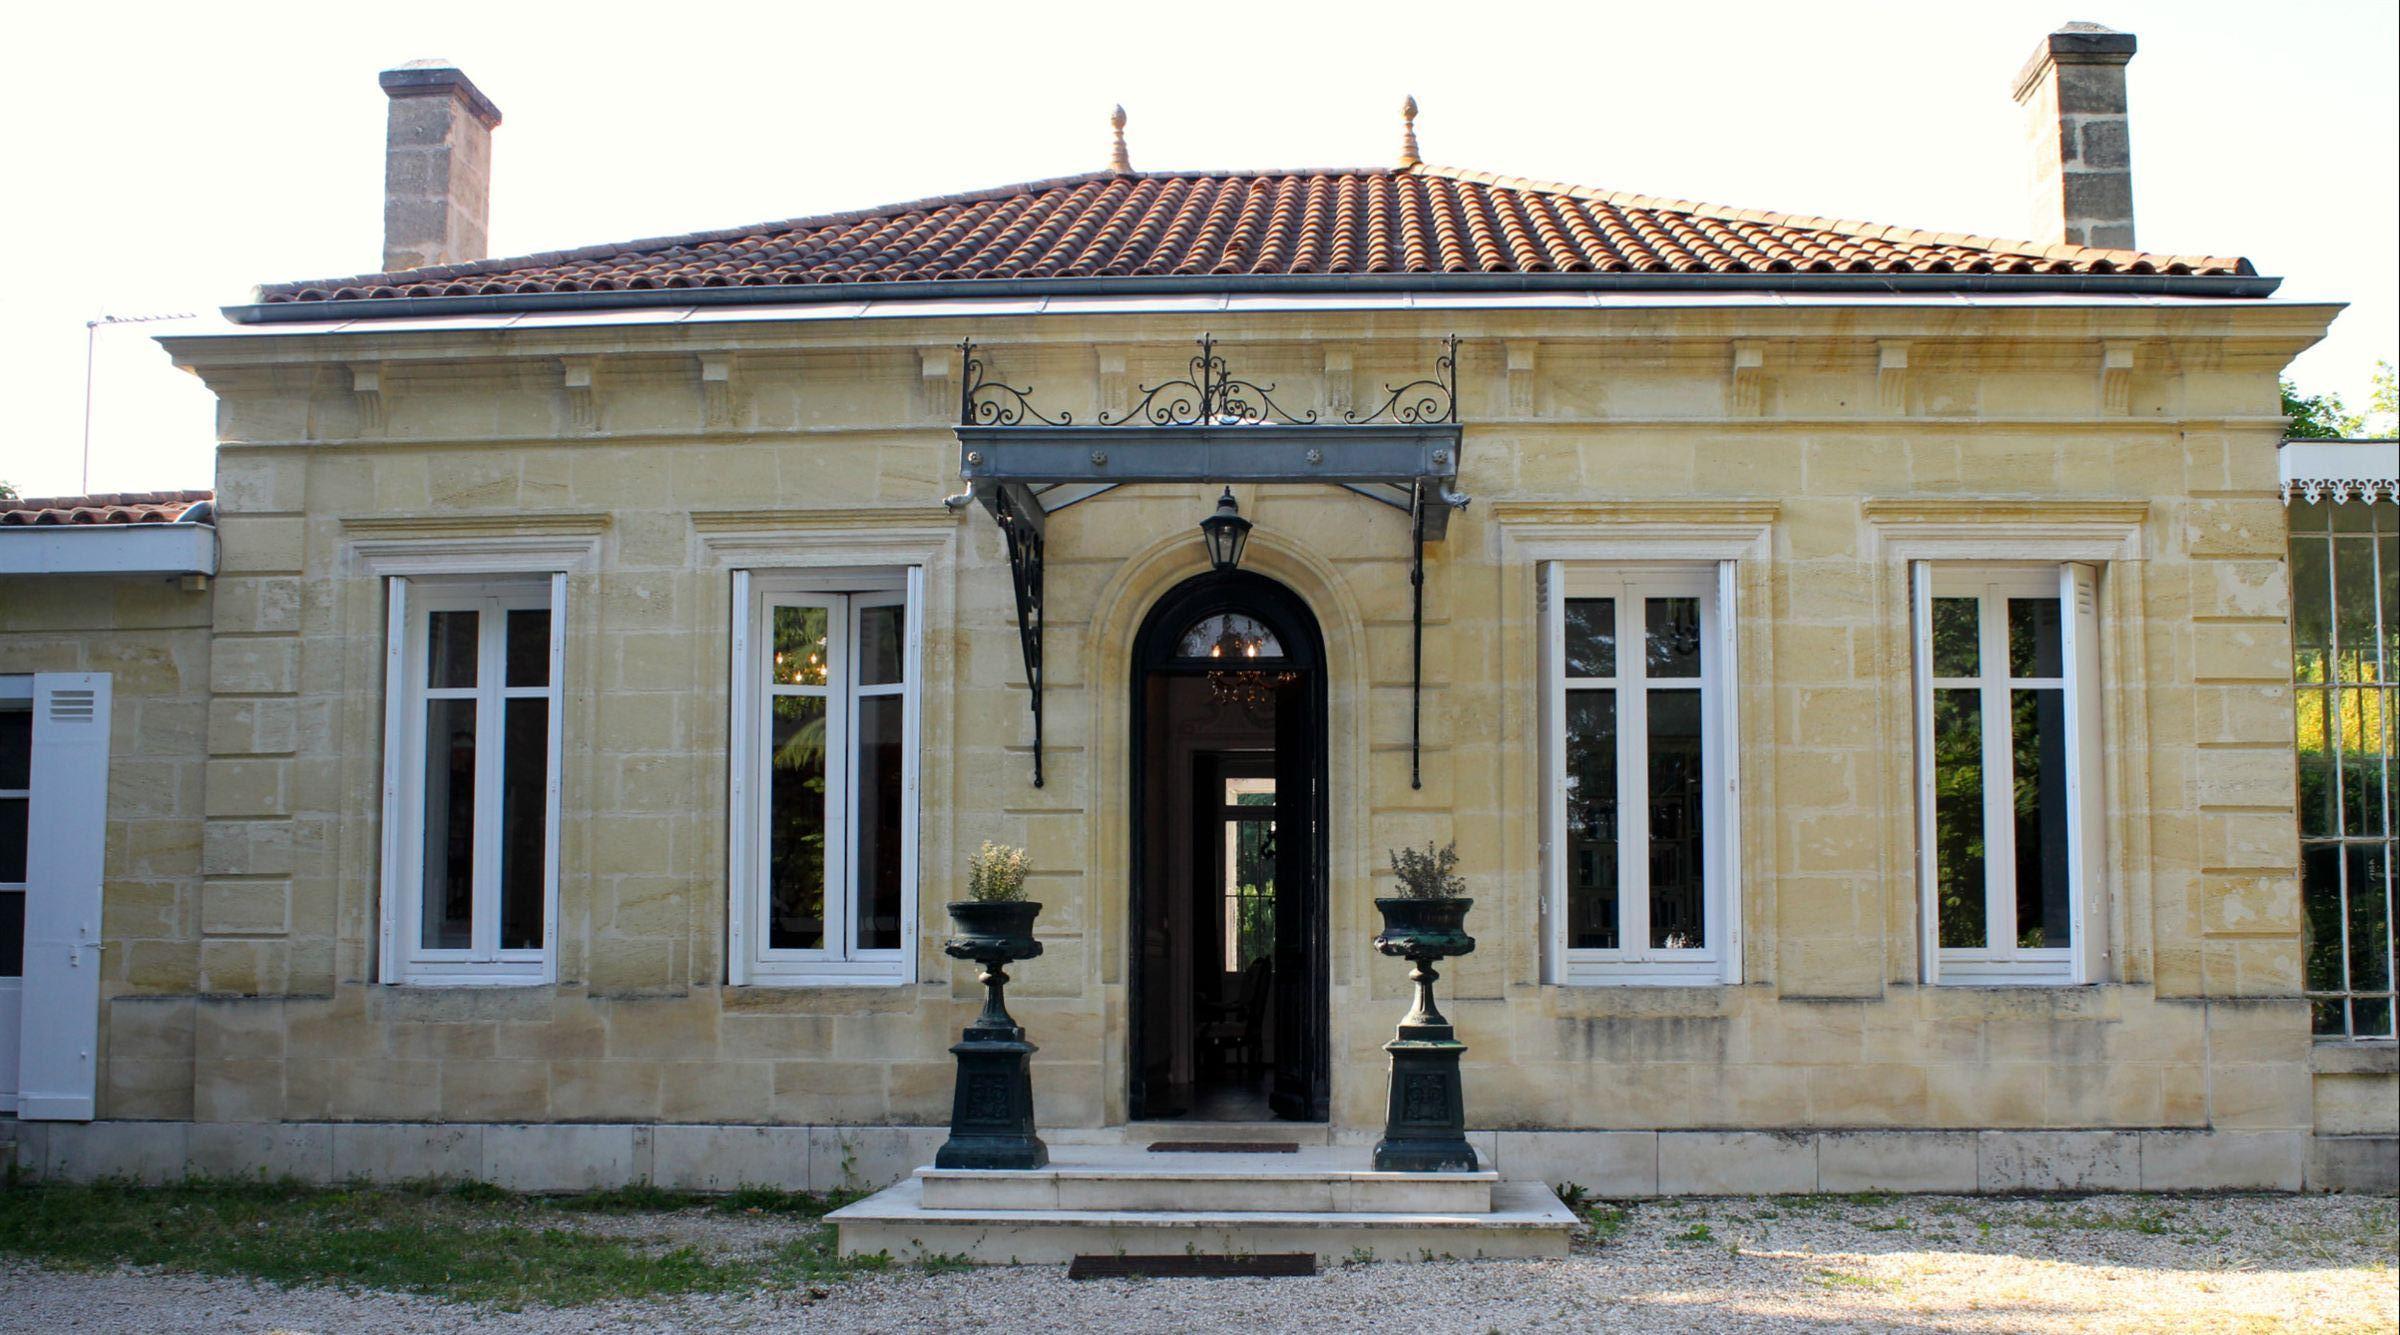 Casa Unifamiliar por un Venta en BORDEAUX - PESSAC - BEAUTIFUL STONE PRIVATE RESIDENCE WITH PARK Bordeaux, Aquitania, 33000 Francia